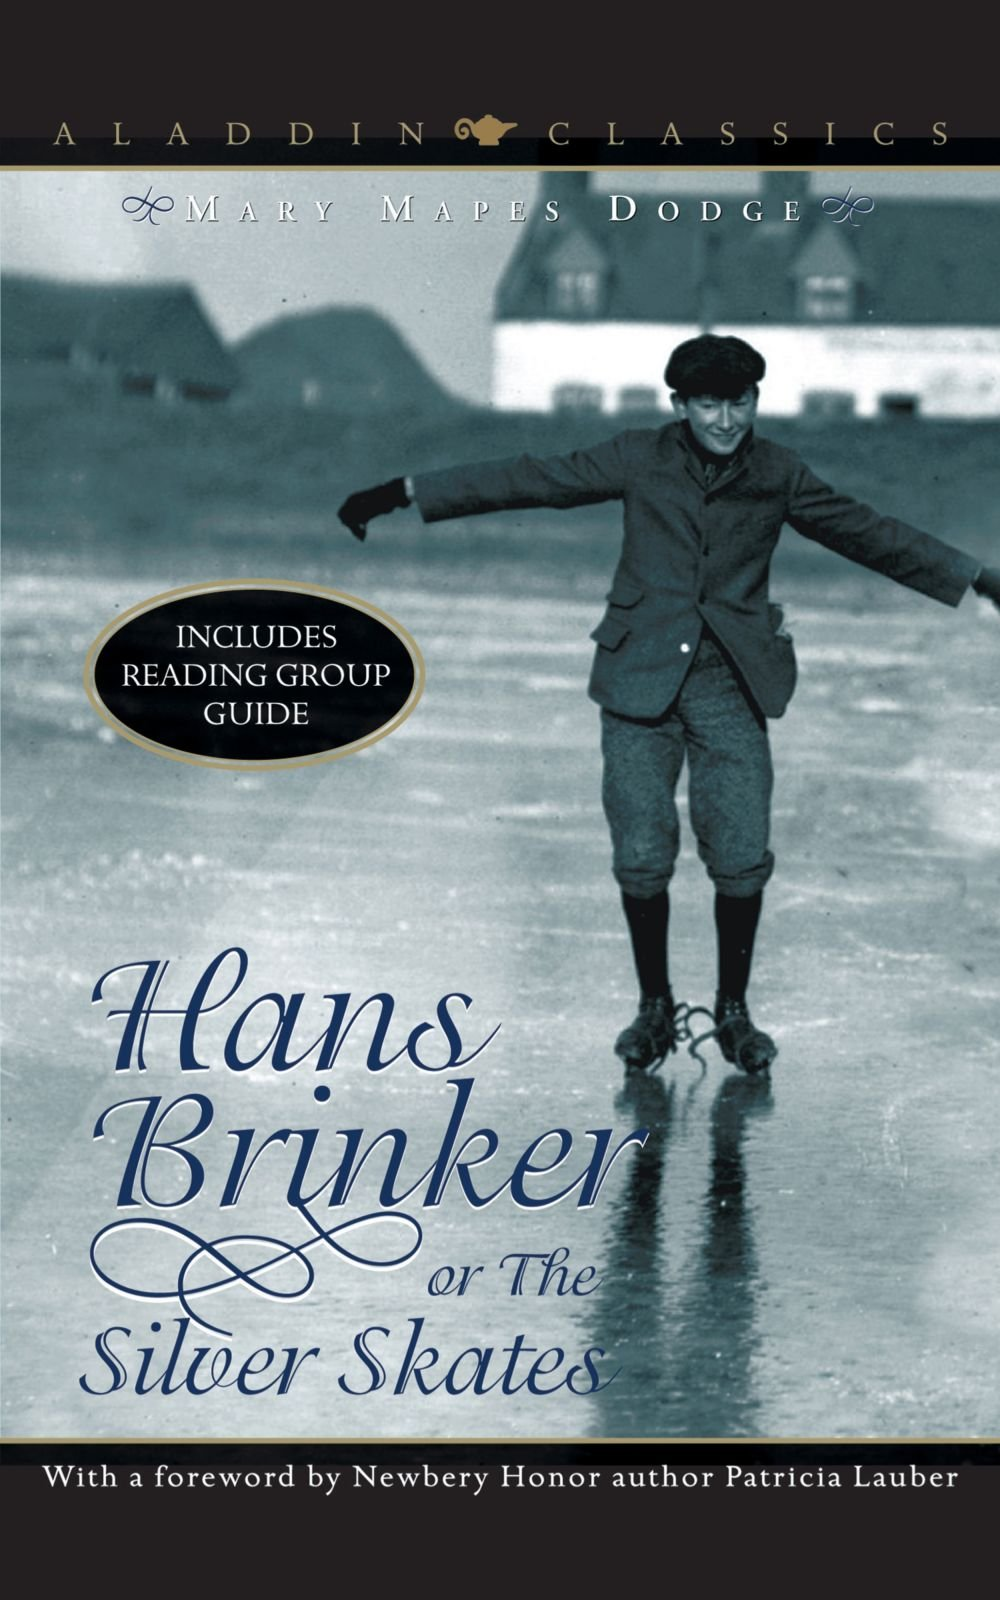 Hans Brinker or The Silver Skates (Aladdin Classics) pdf